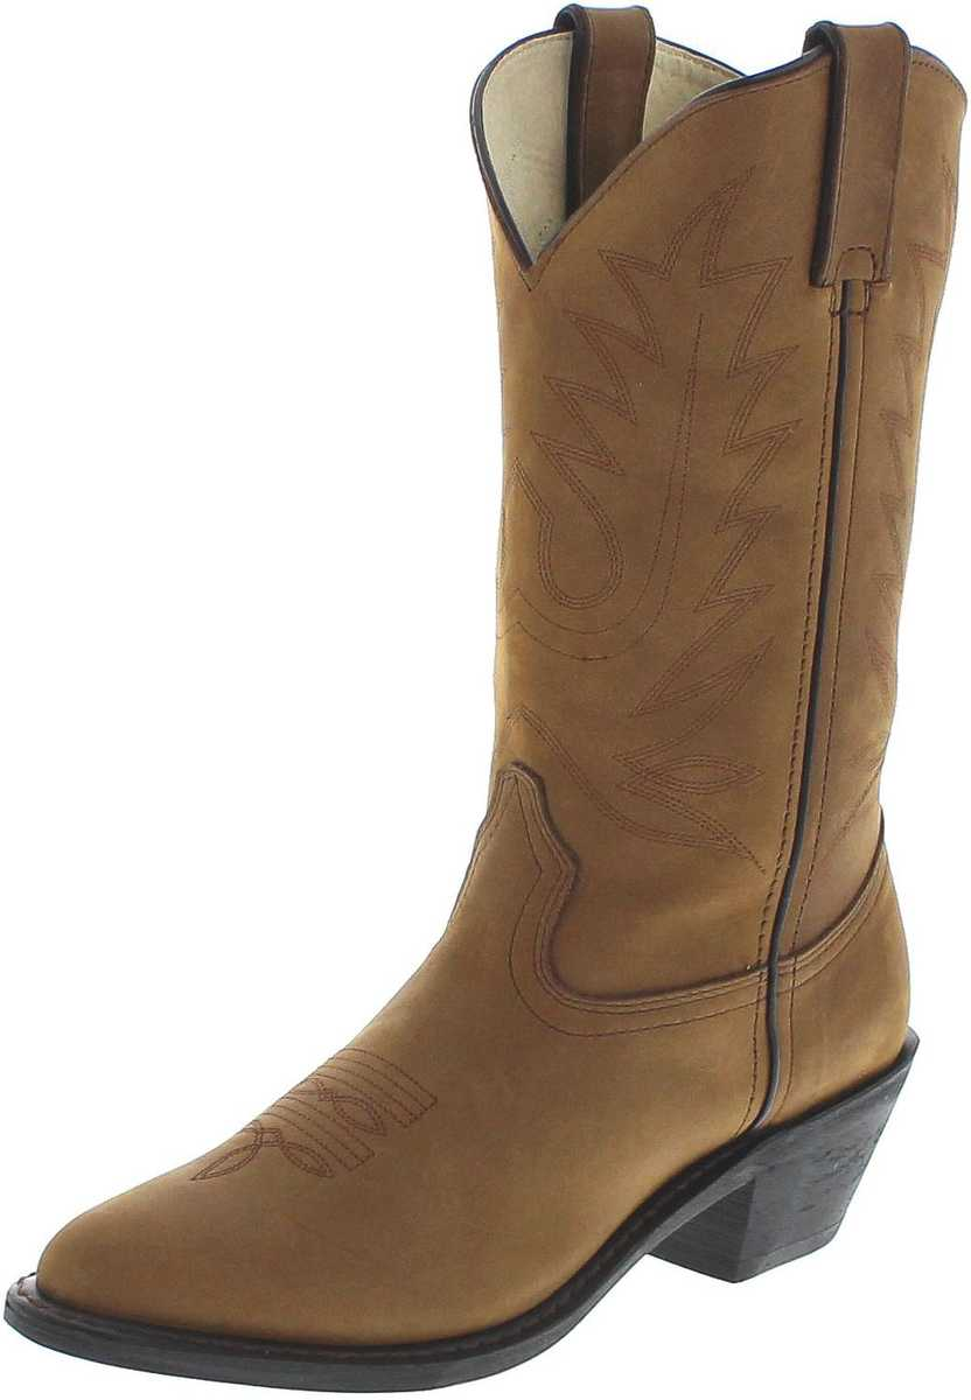 Durango Boots CLASSIC RD4112 Tan Westernstiefel - braun